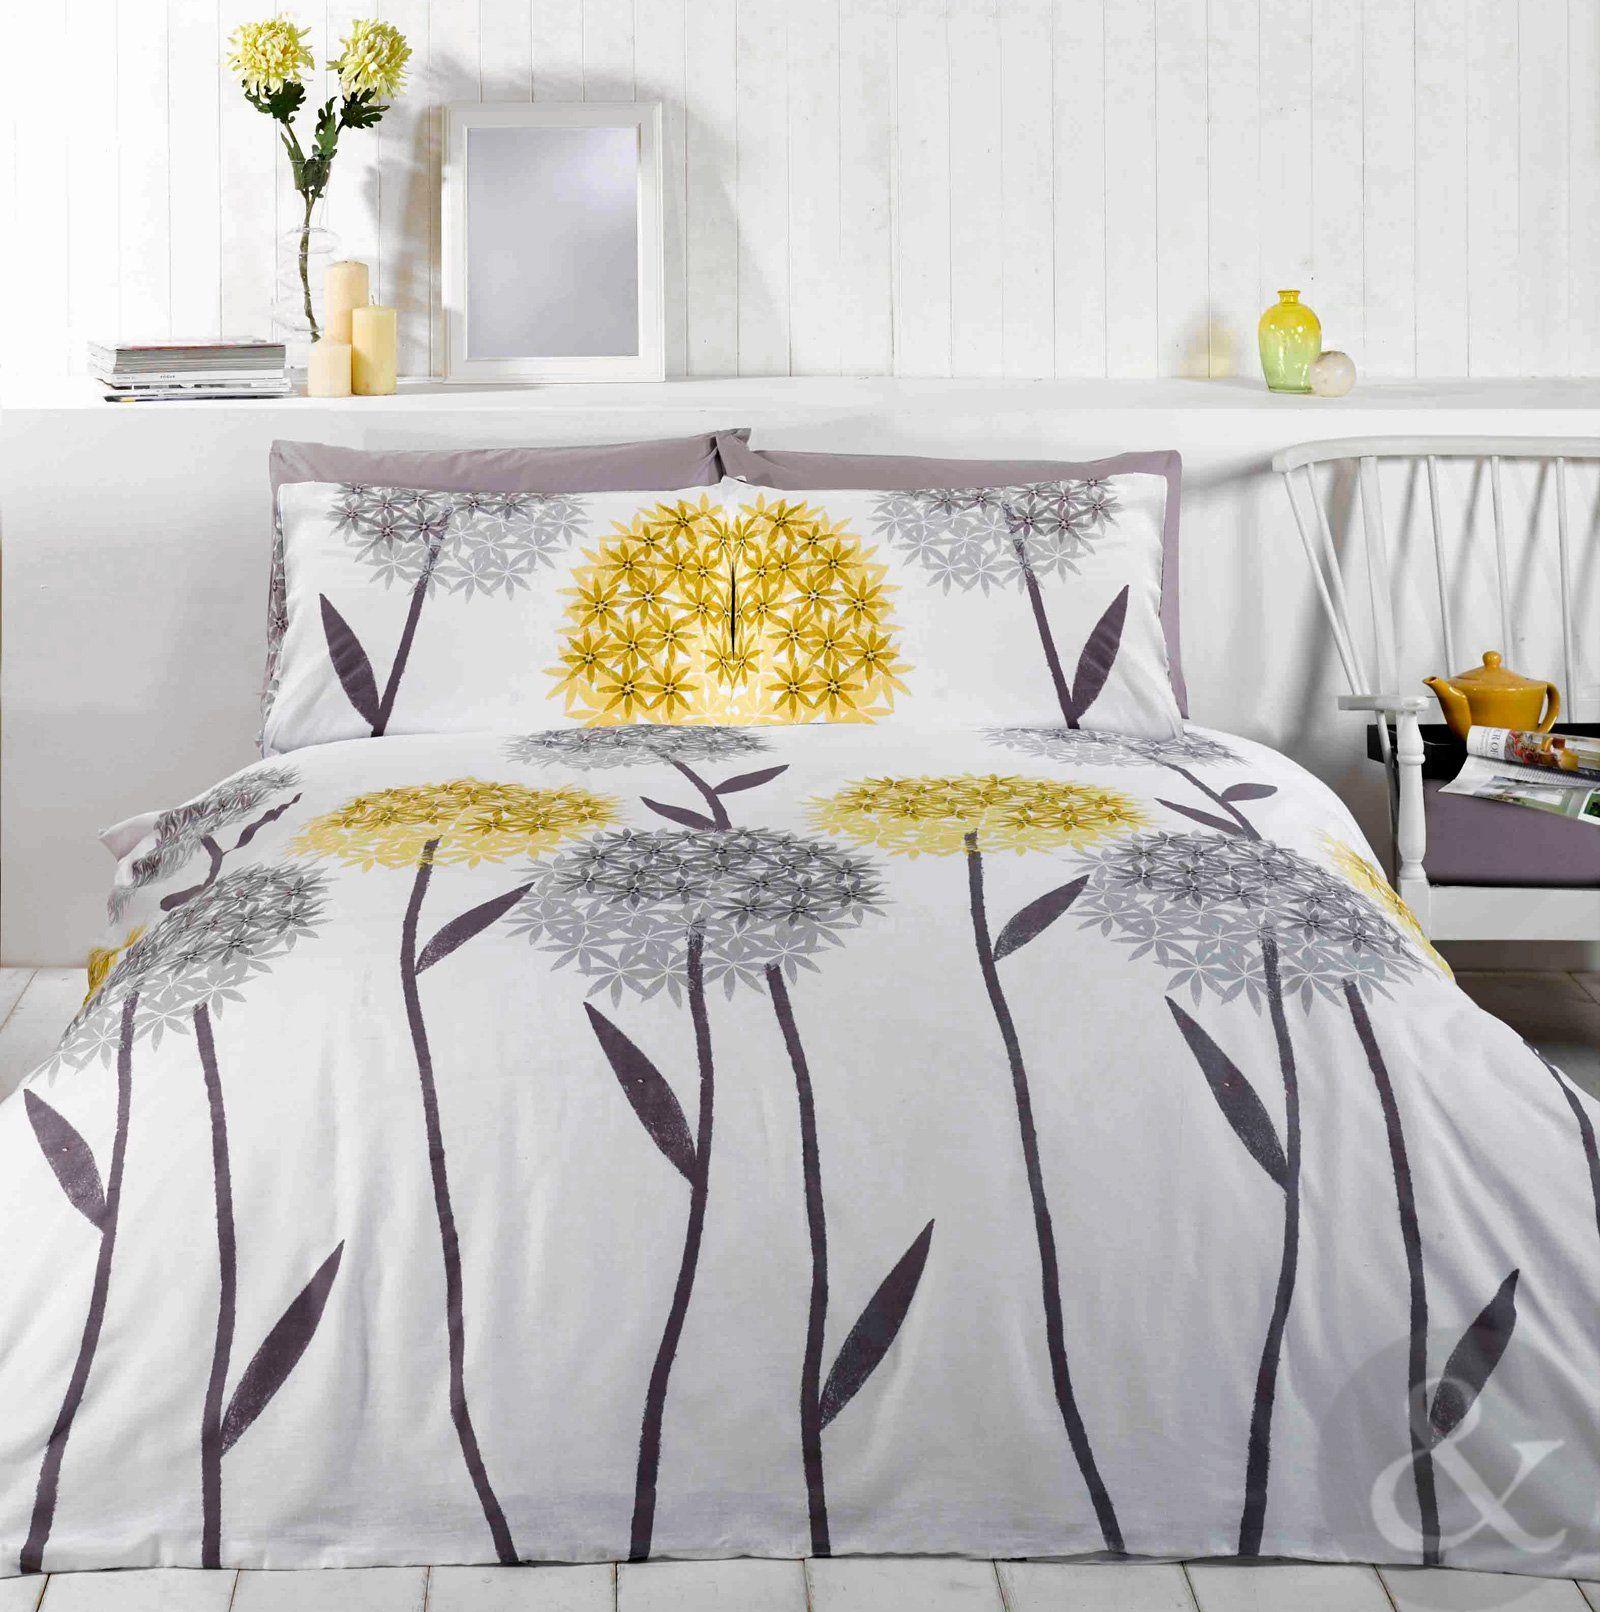 Gray Duvet Cover King : Allium floral duvet cover contemporary printed white